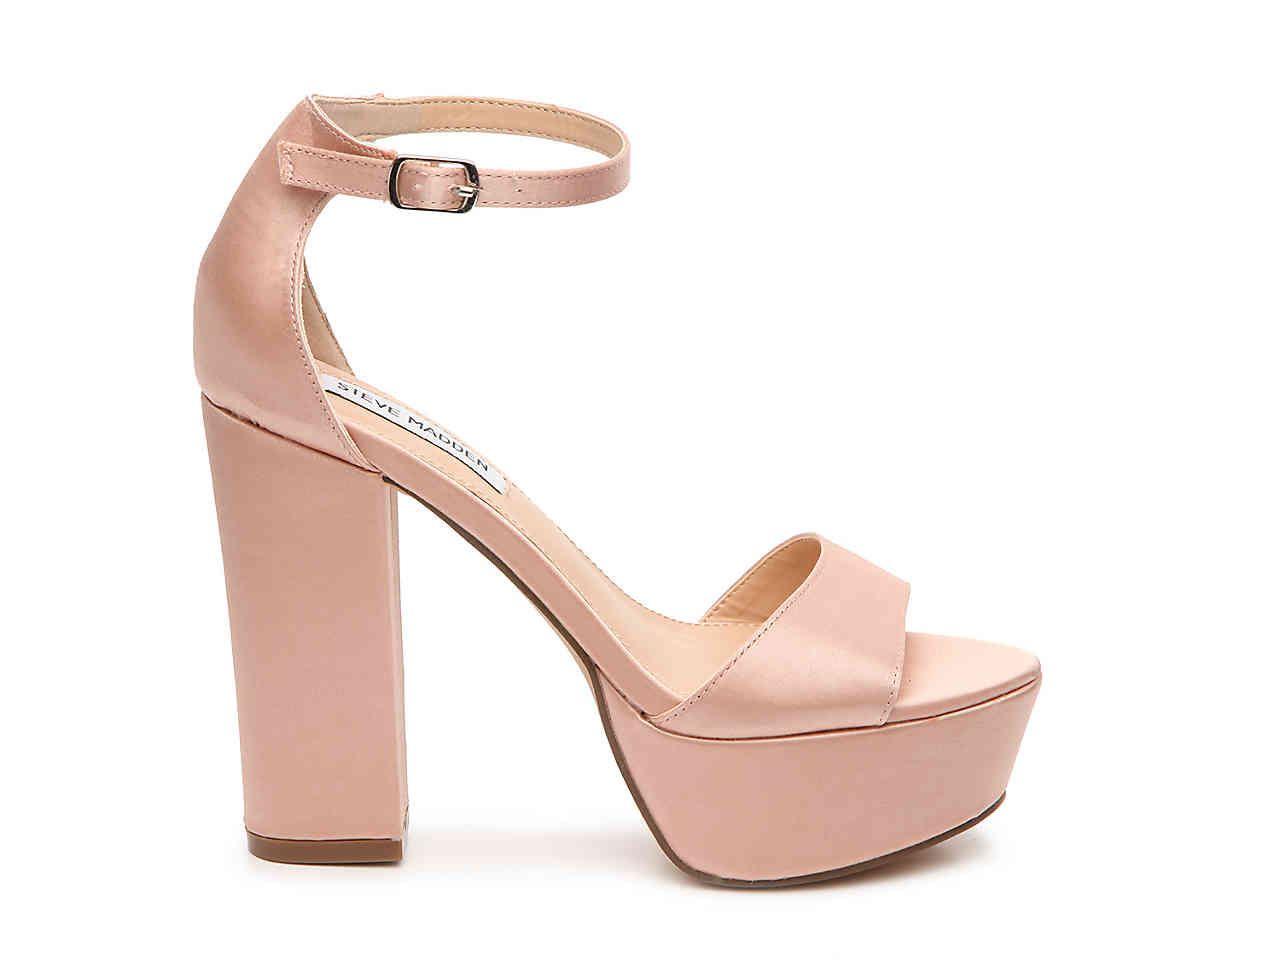 c91aa3cc8911 Steve Madden Gilda Sandal Women s Shoes